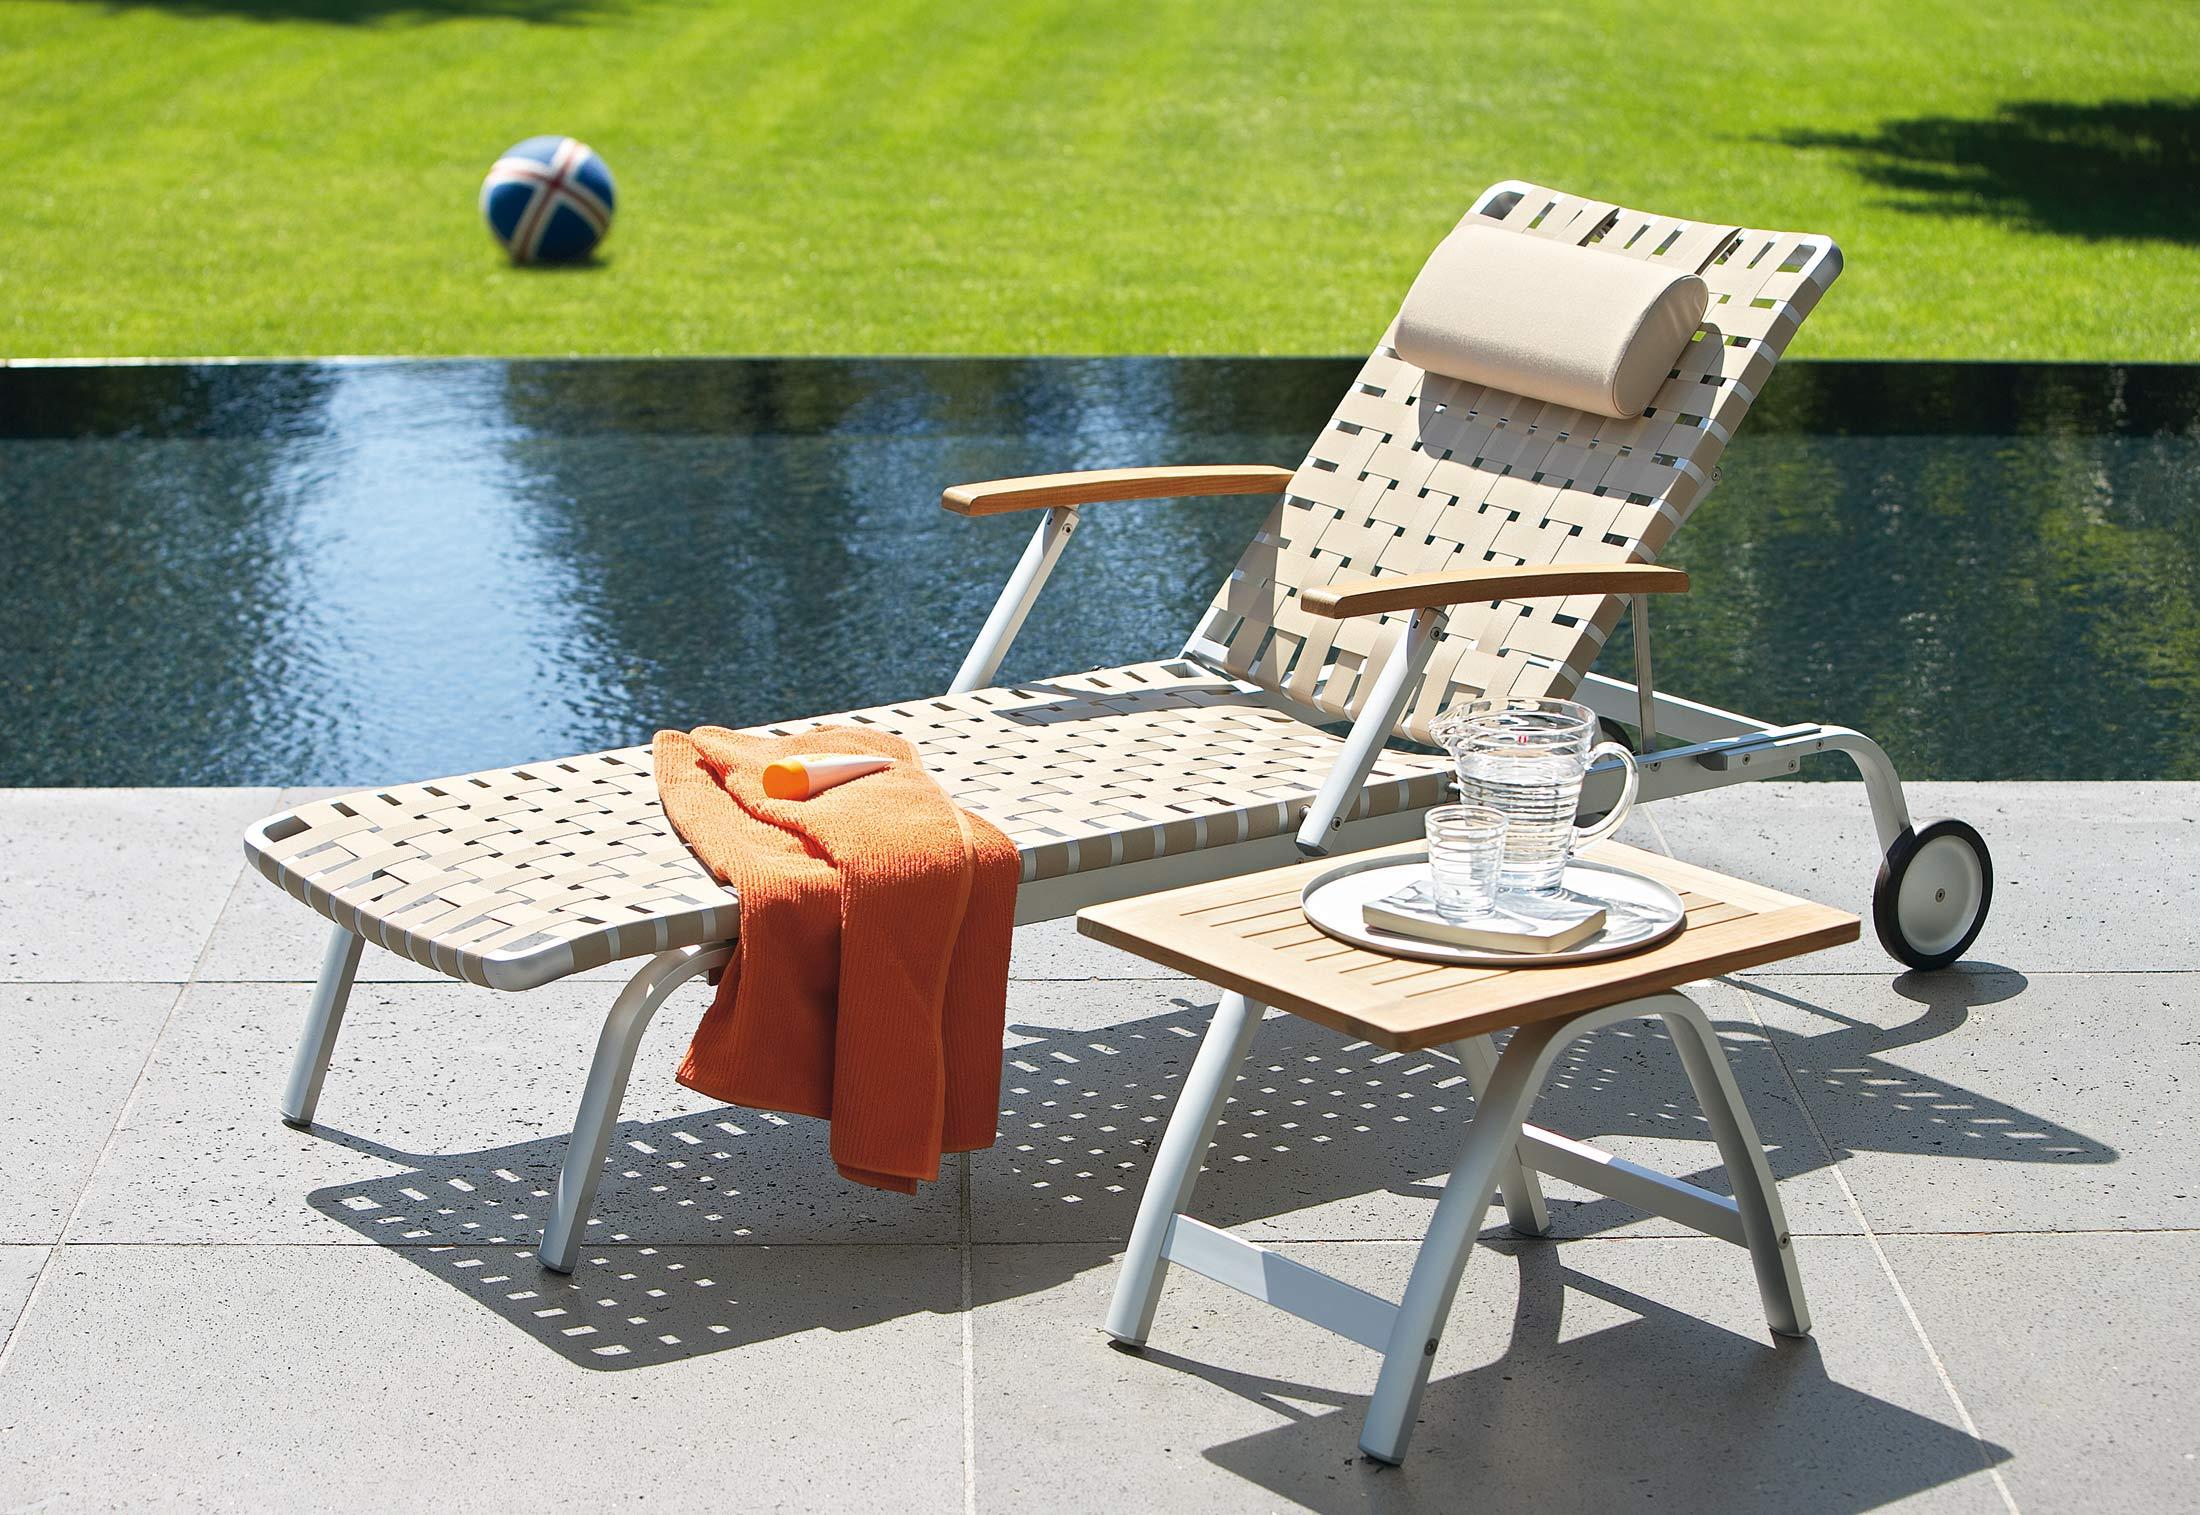 United States Deck Chair by Garpa